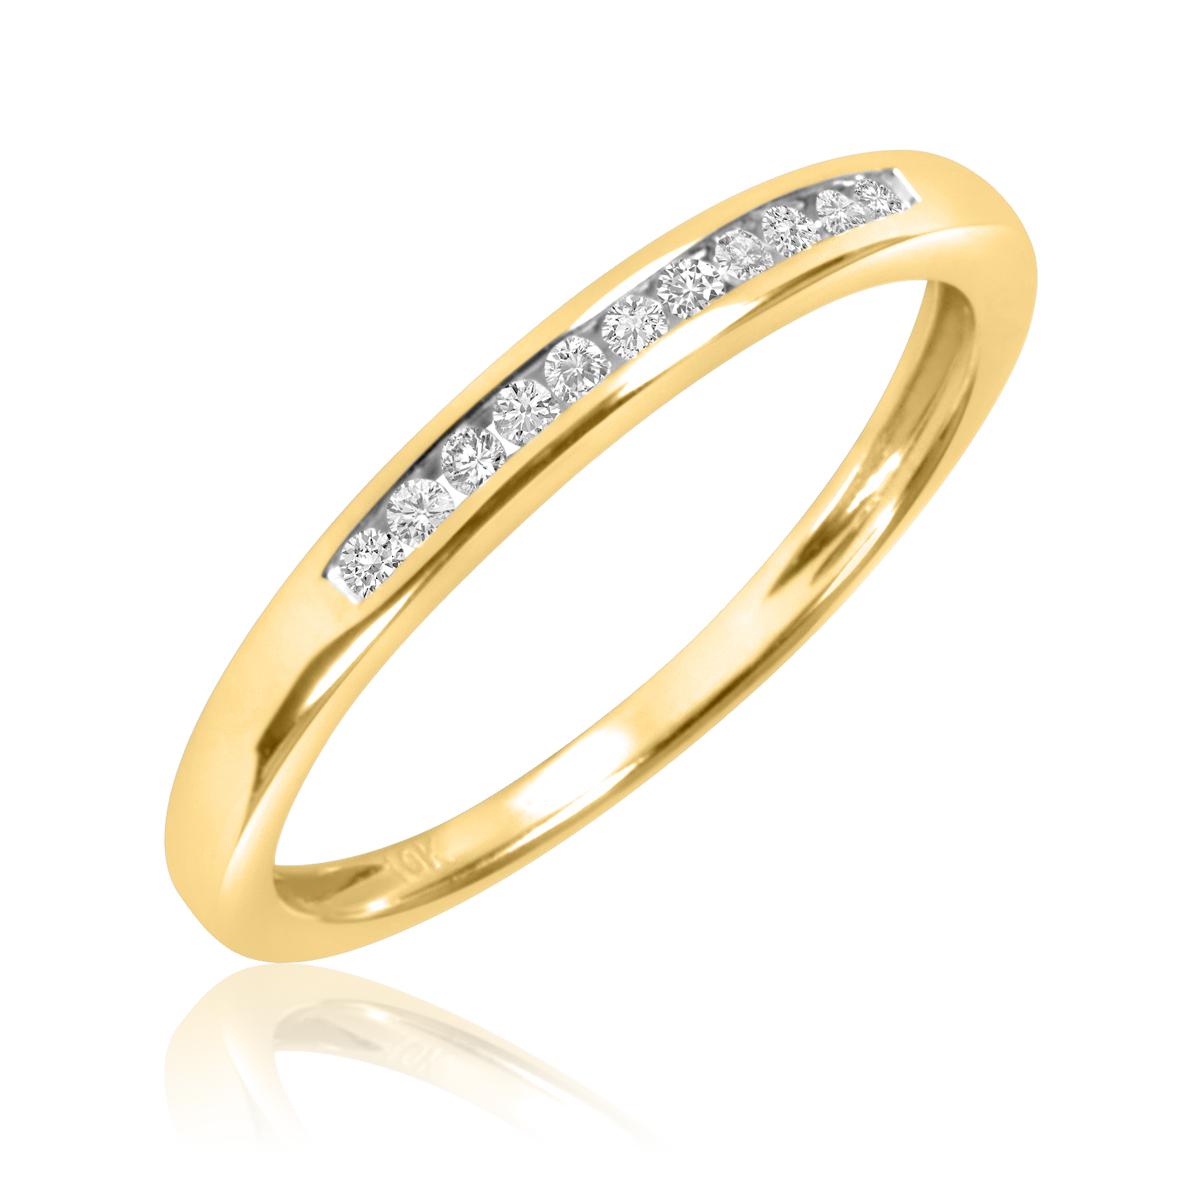 1/10 CT. T.W. Round Cut Diamond Ladies Wedding Band 10K Yellow Gold- Size 8